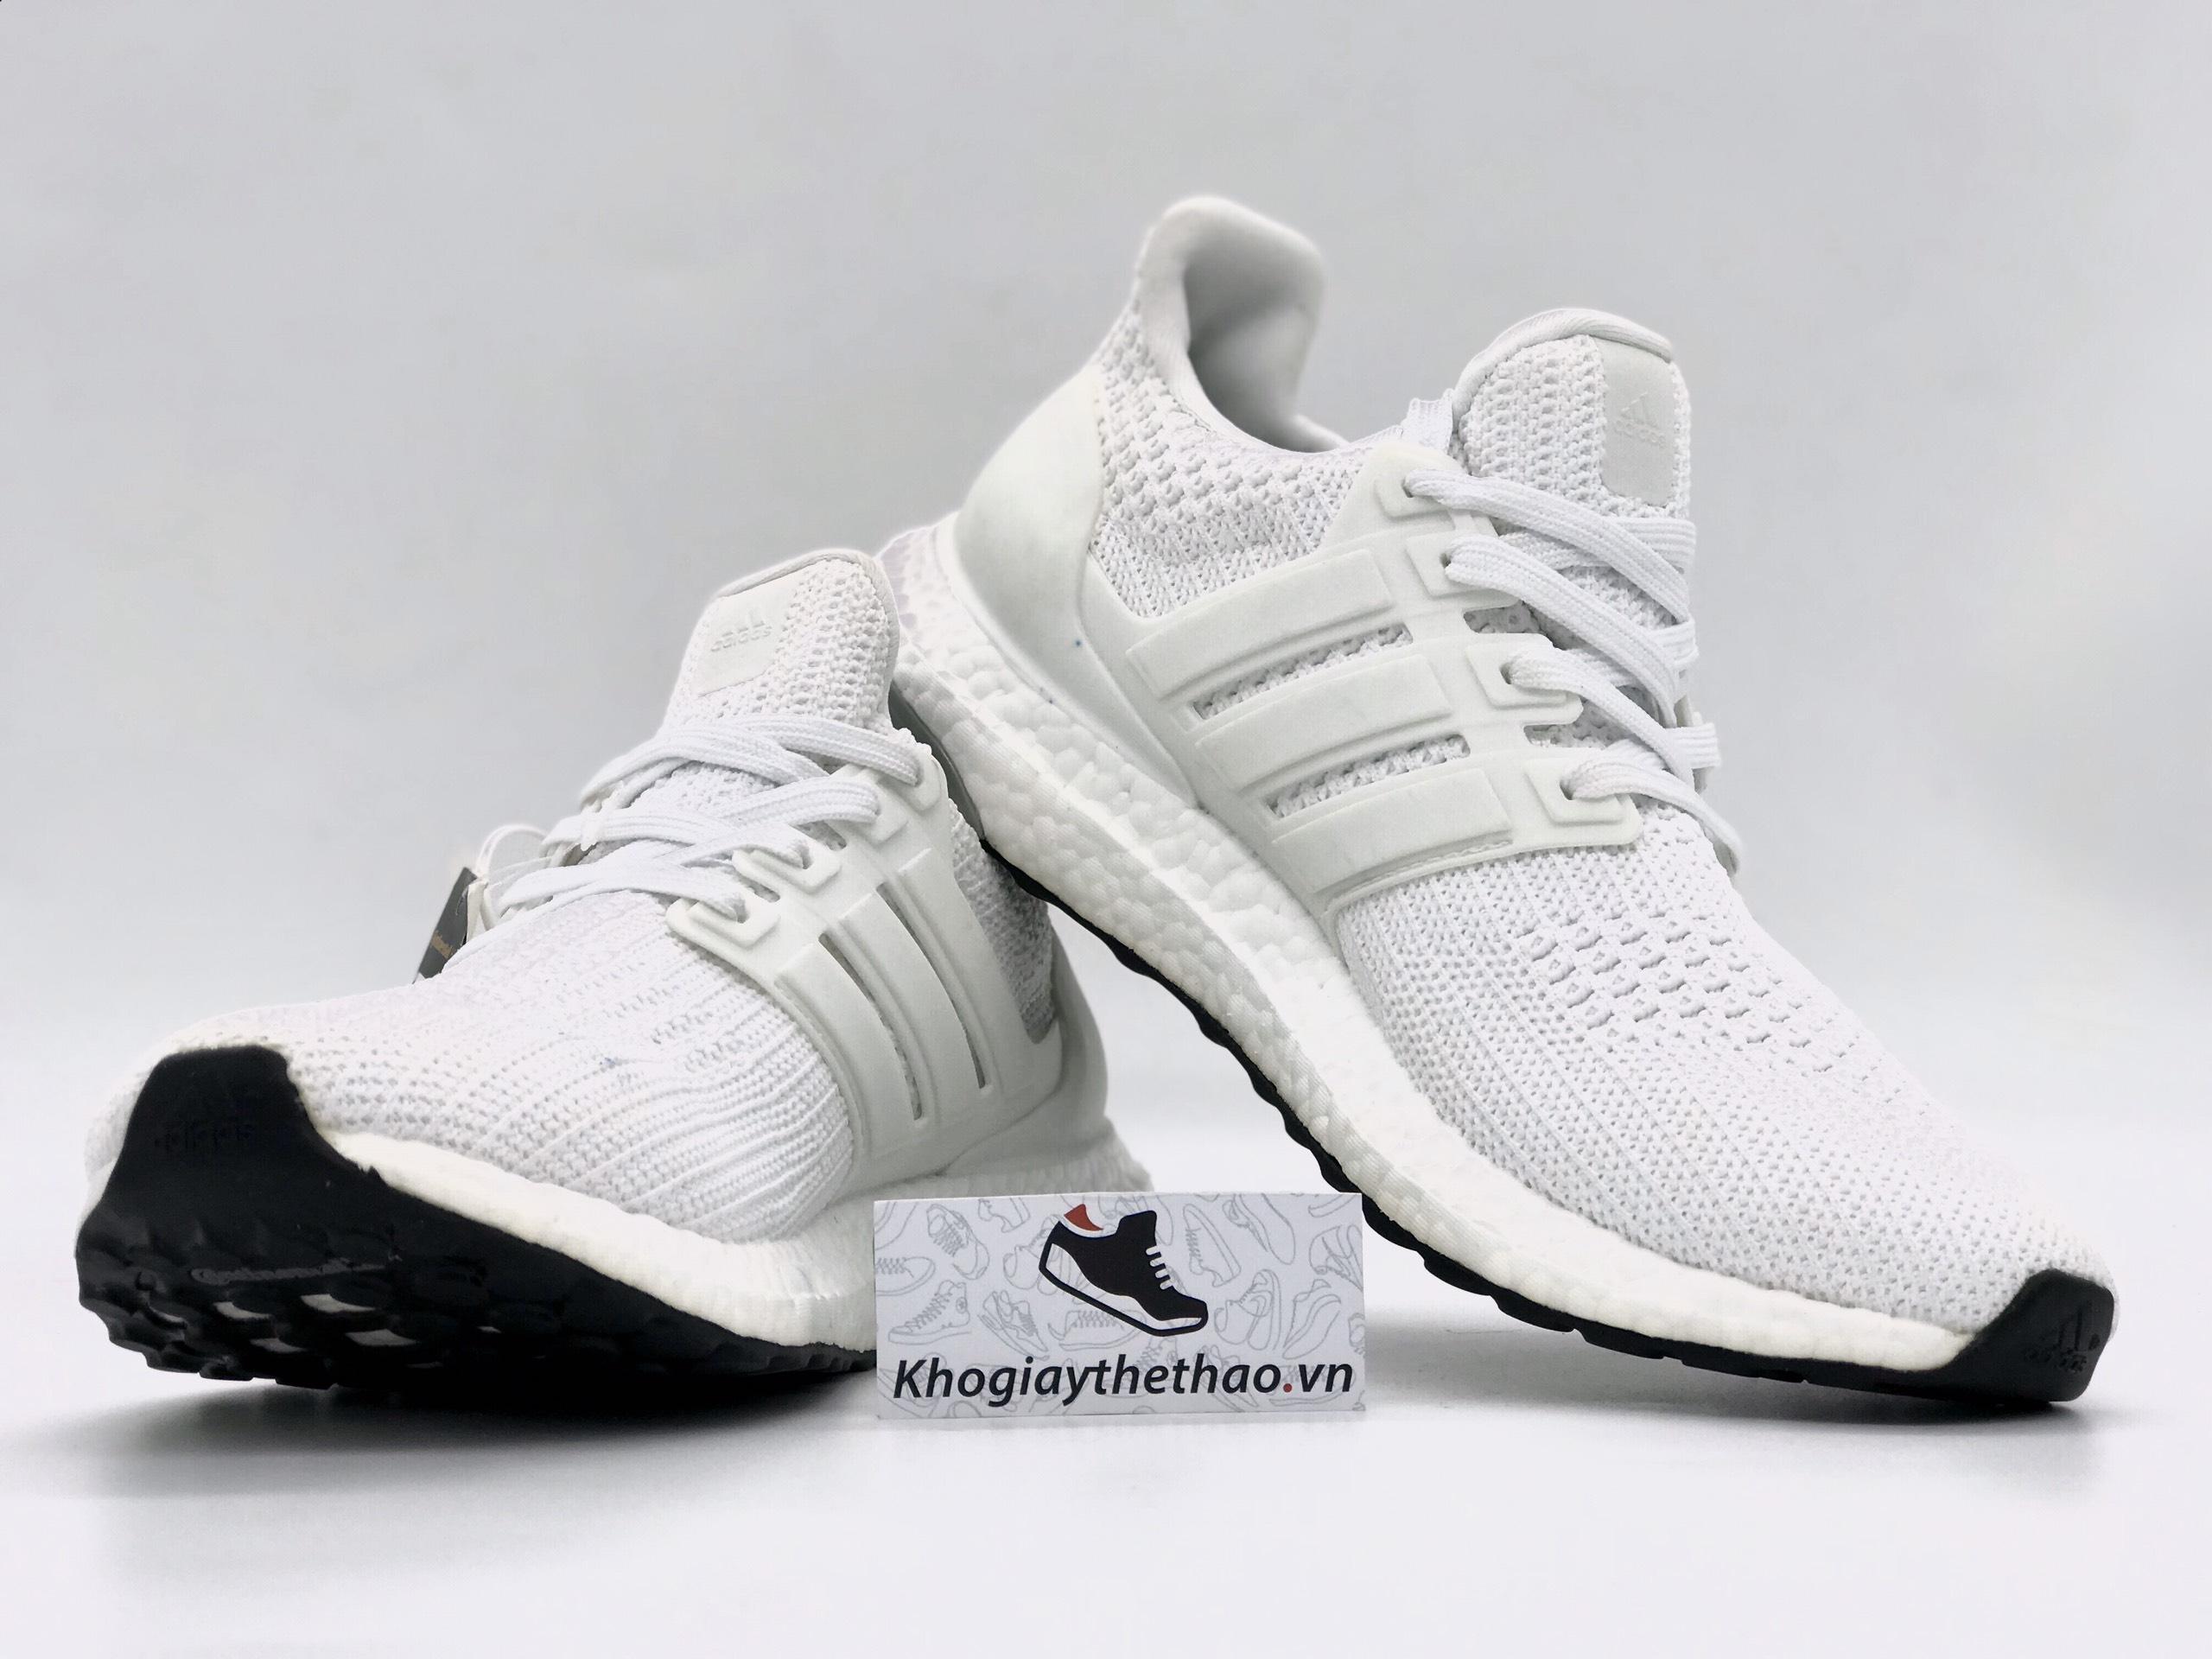 Giày Adidas Ultraboost 4.0 trắng